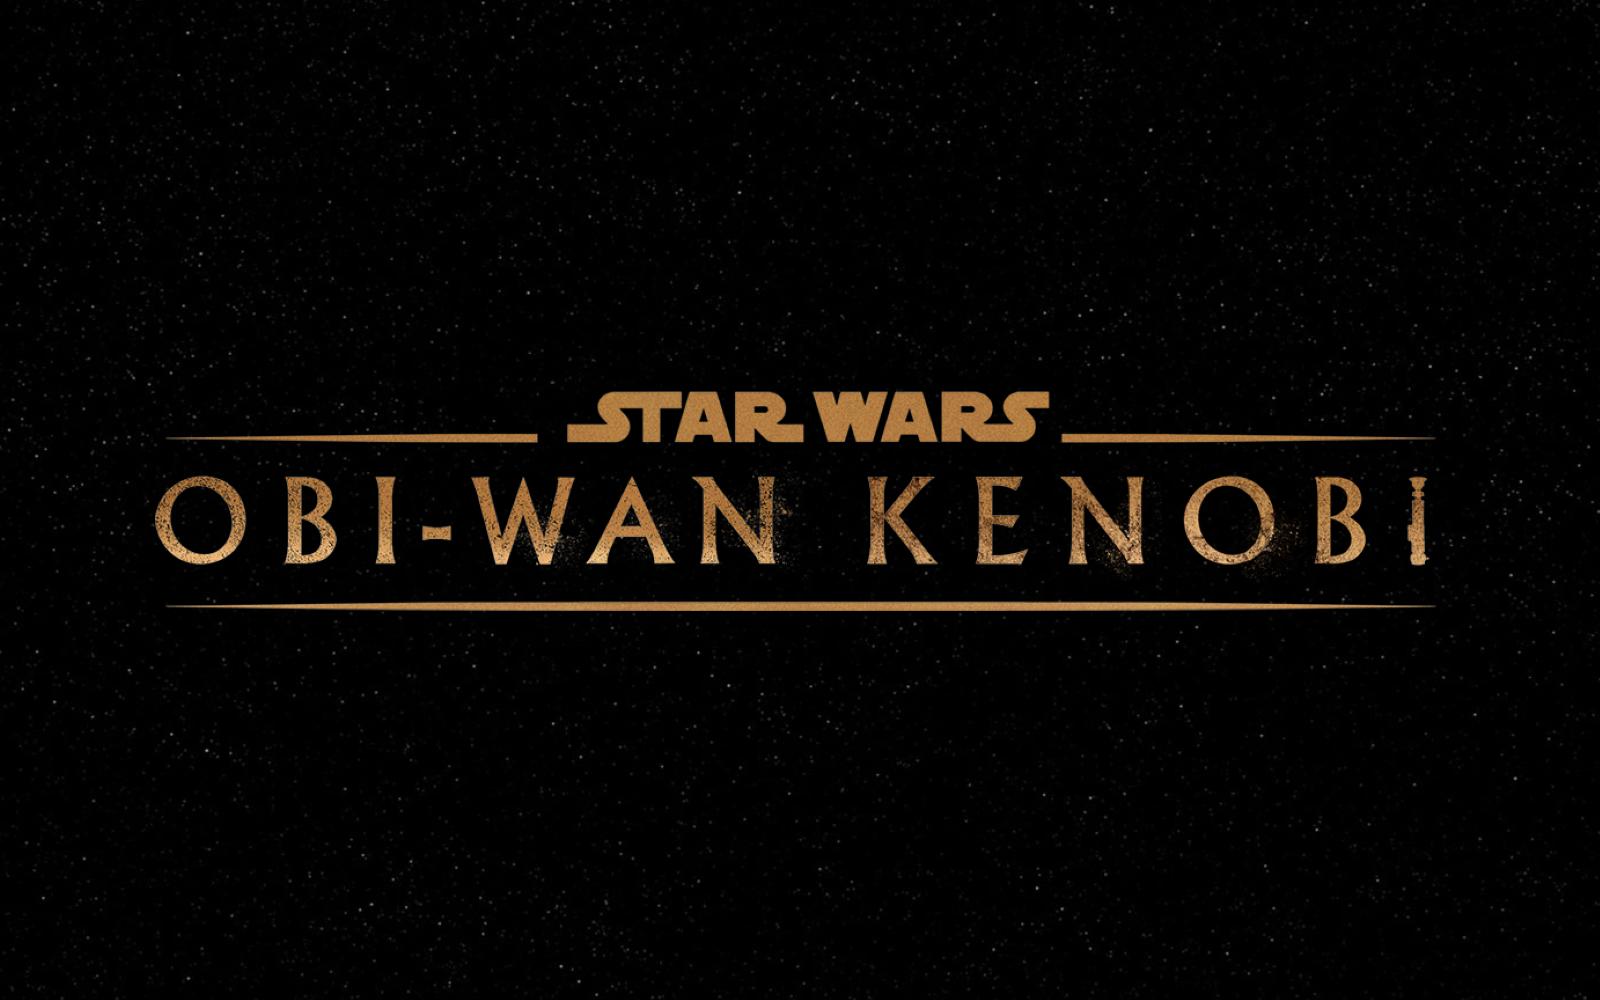 Full Main Cast Announced For Upcoming Obi-Wan Kenobi Series